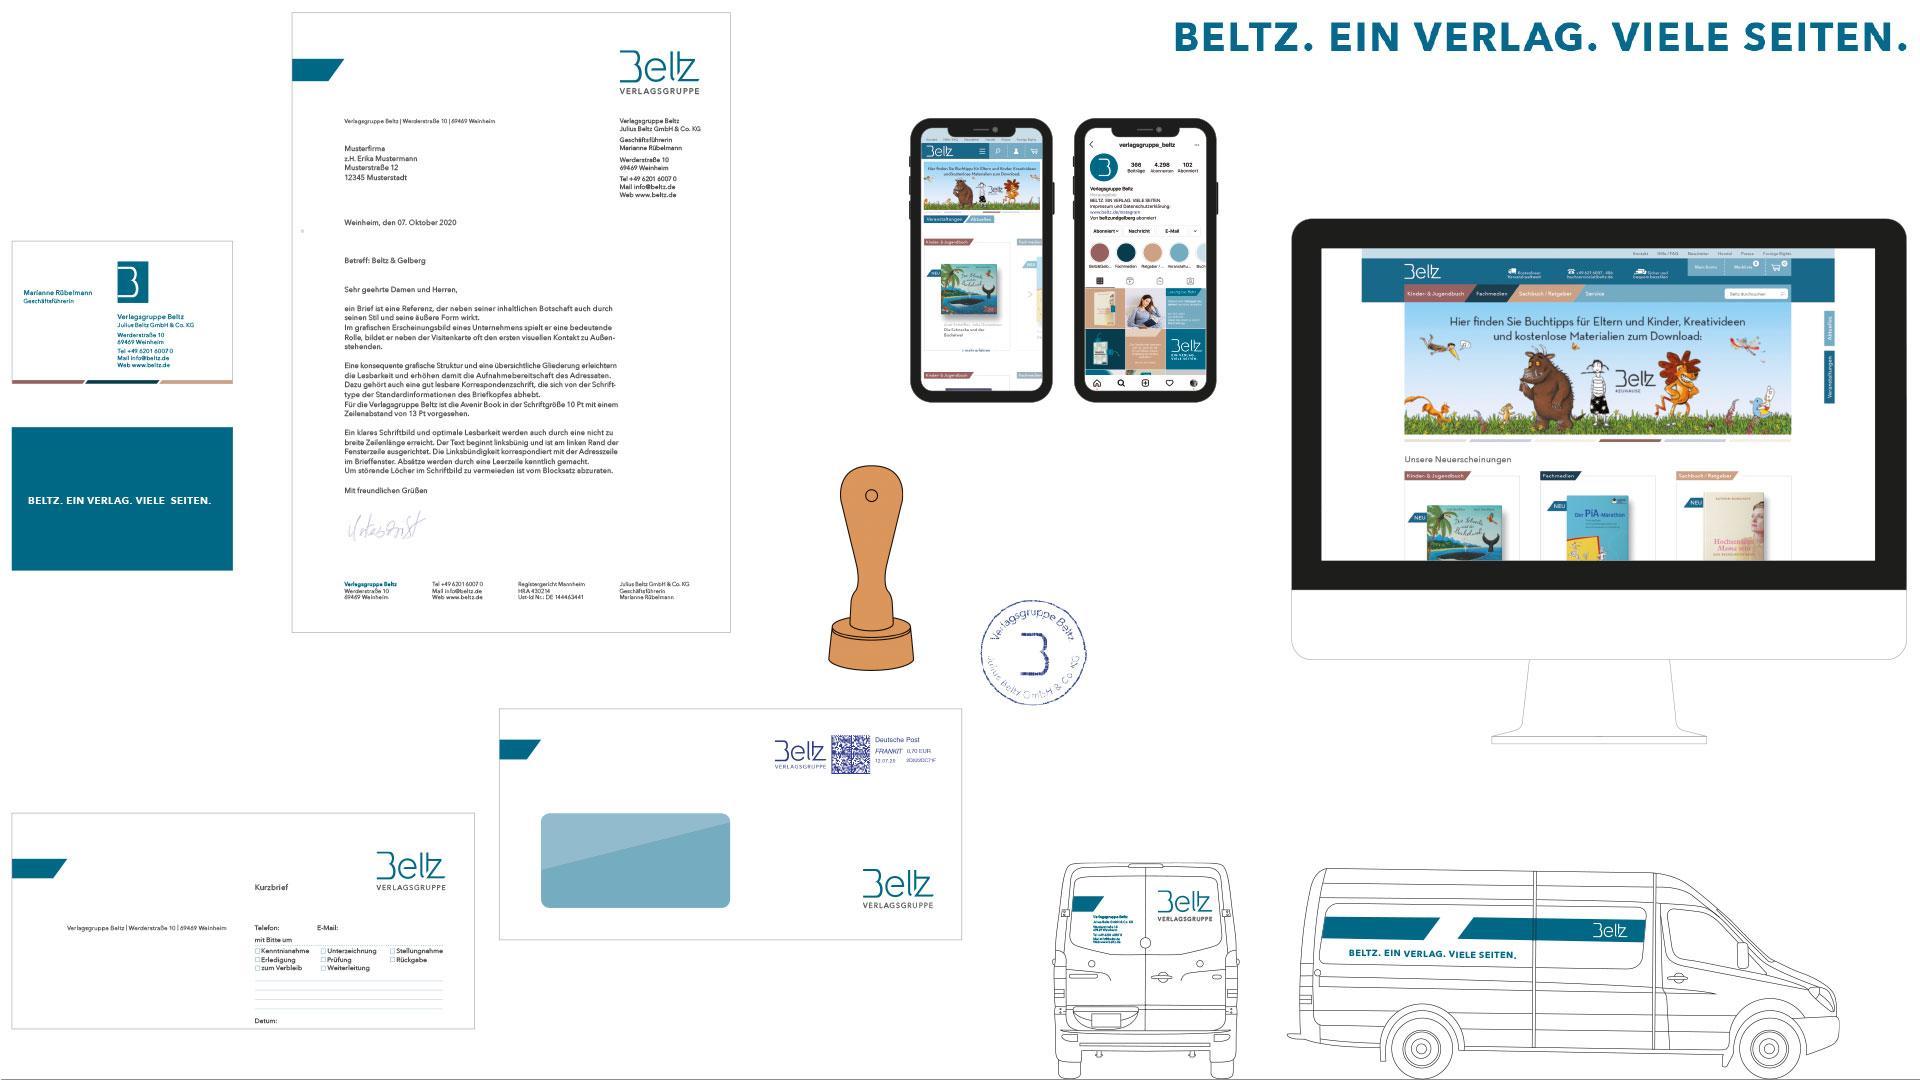 Übersicht Geschäftspapiere Verlagsgruppe Beltz